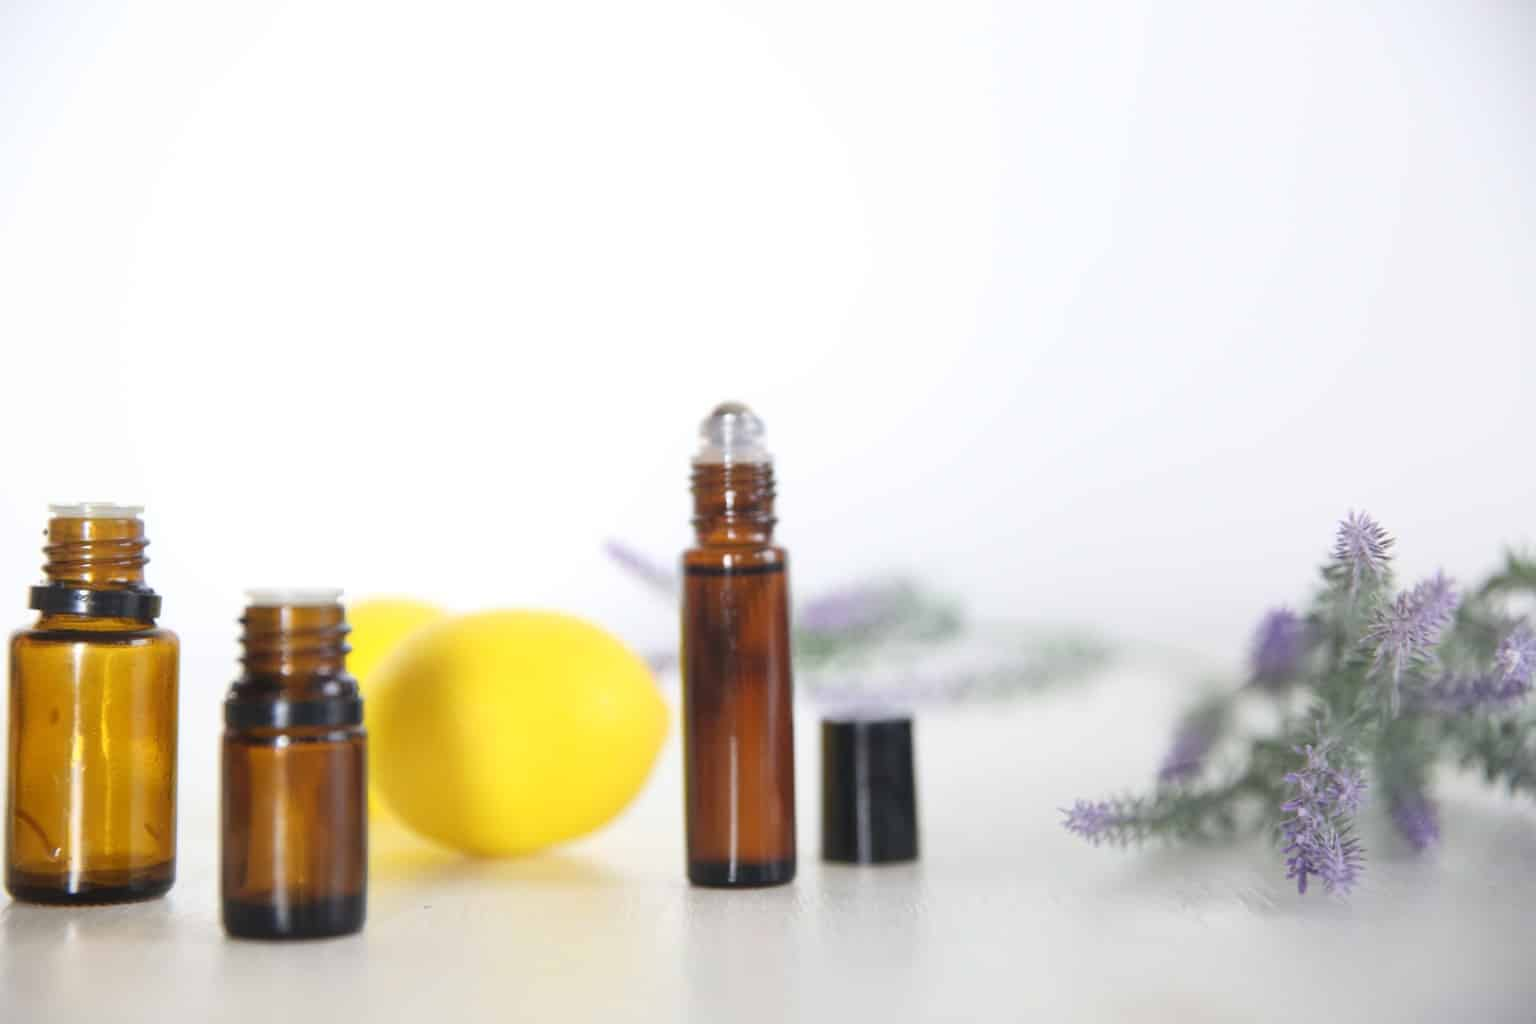 Roller bottles, fresh lemon, and lavender with white background.